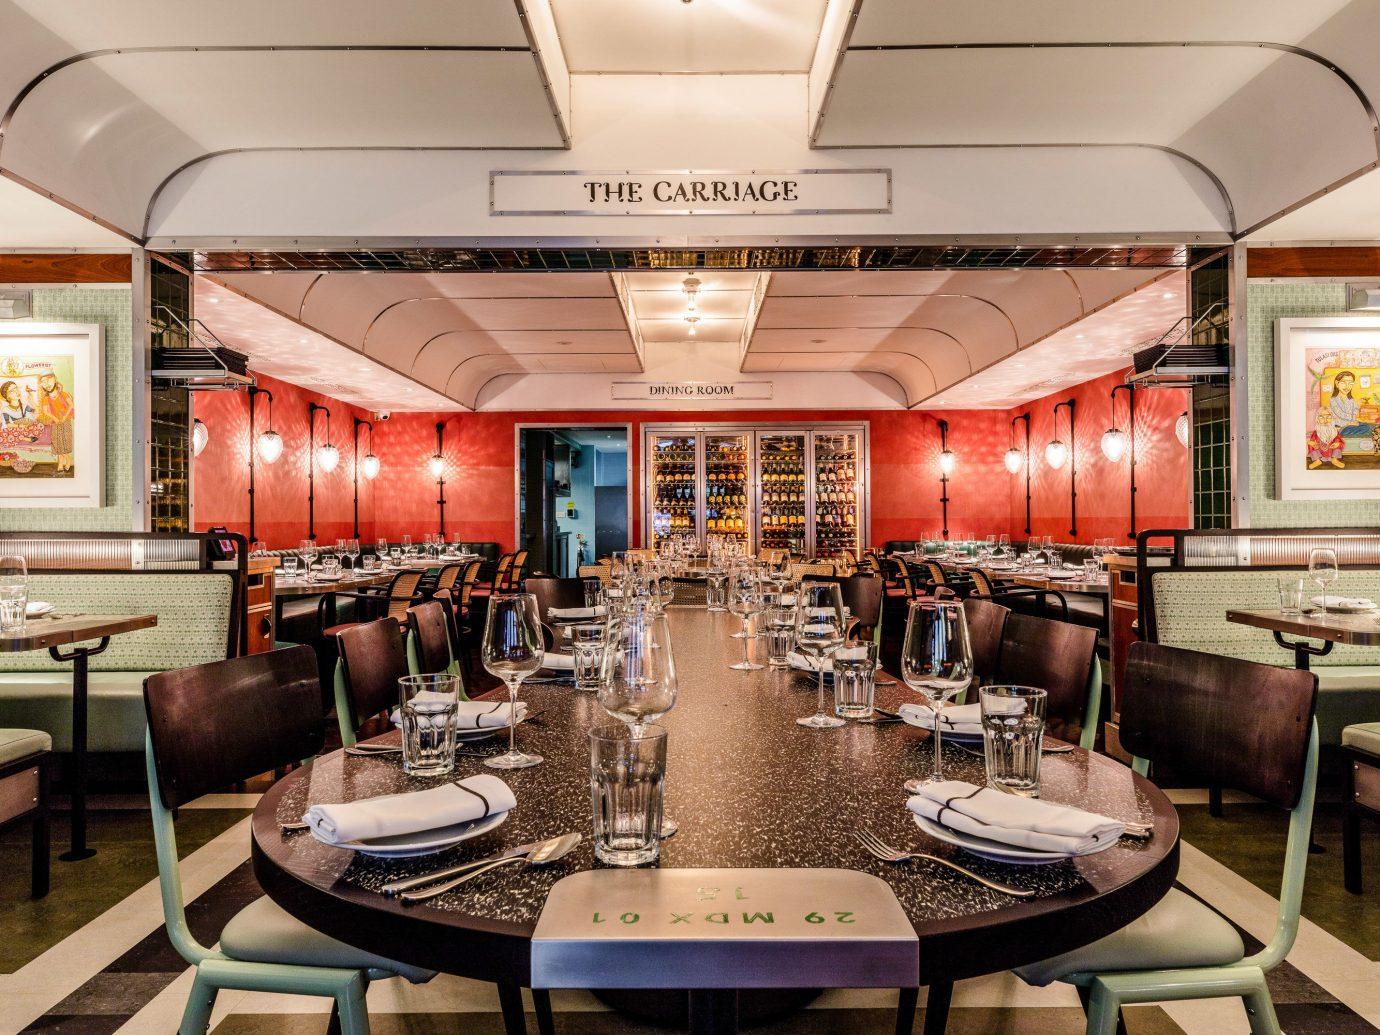 Food + Drink London table indoor restaurant interior design ceiling café several